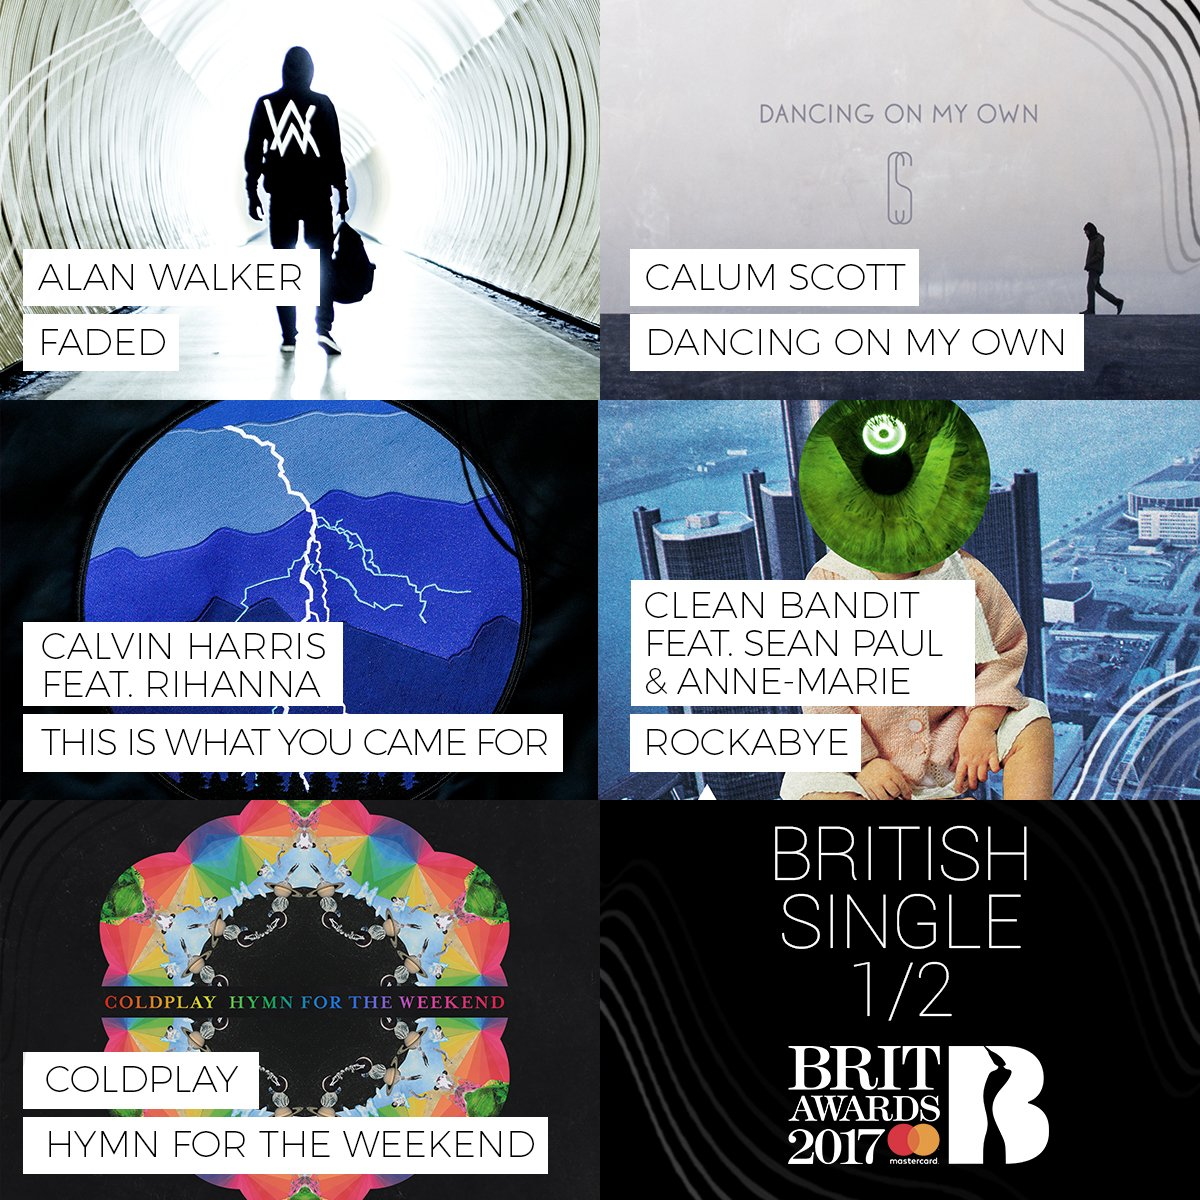 #BRITs 2017 British Single nominees 1/3: @IAmAlanWalker, @CalumScott, @CalvinHarris ft. @Rihanna...